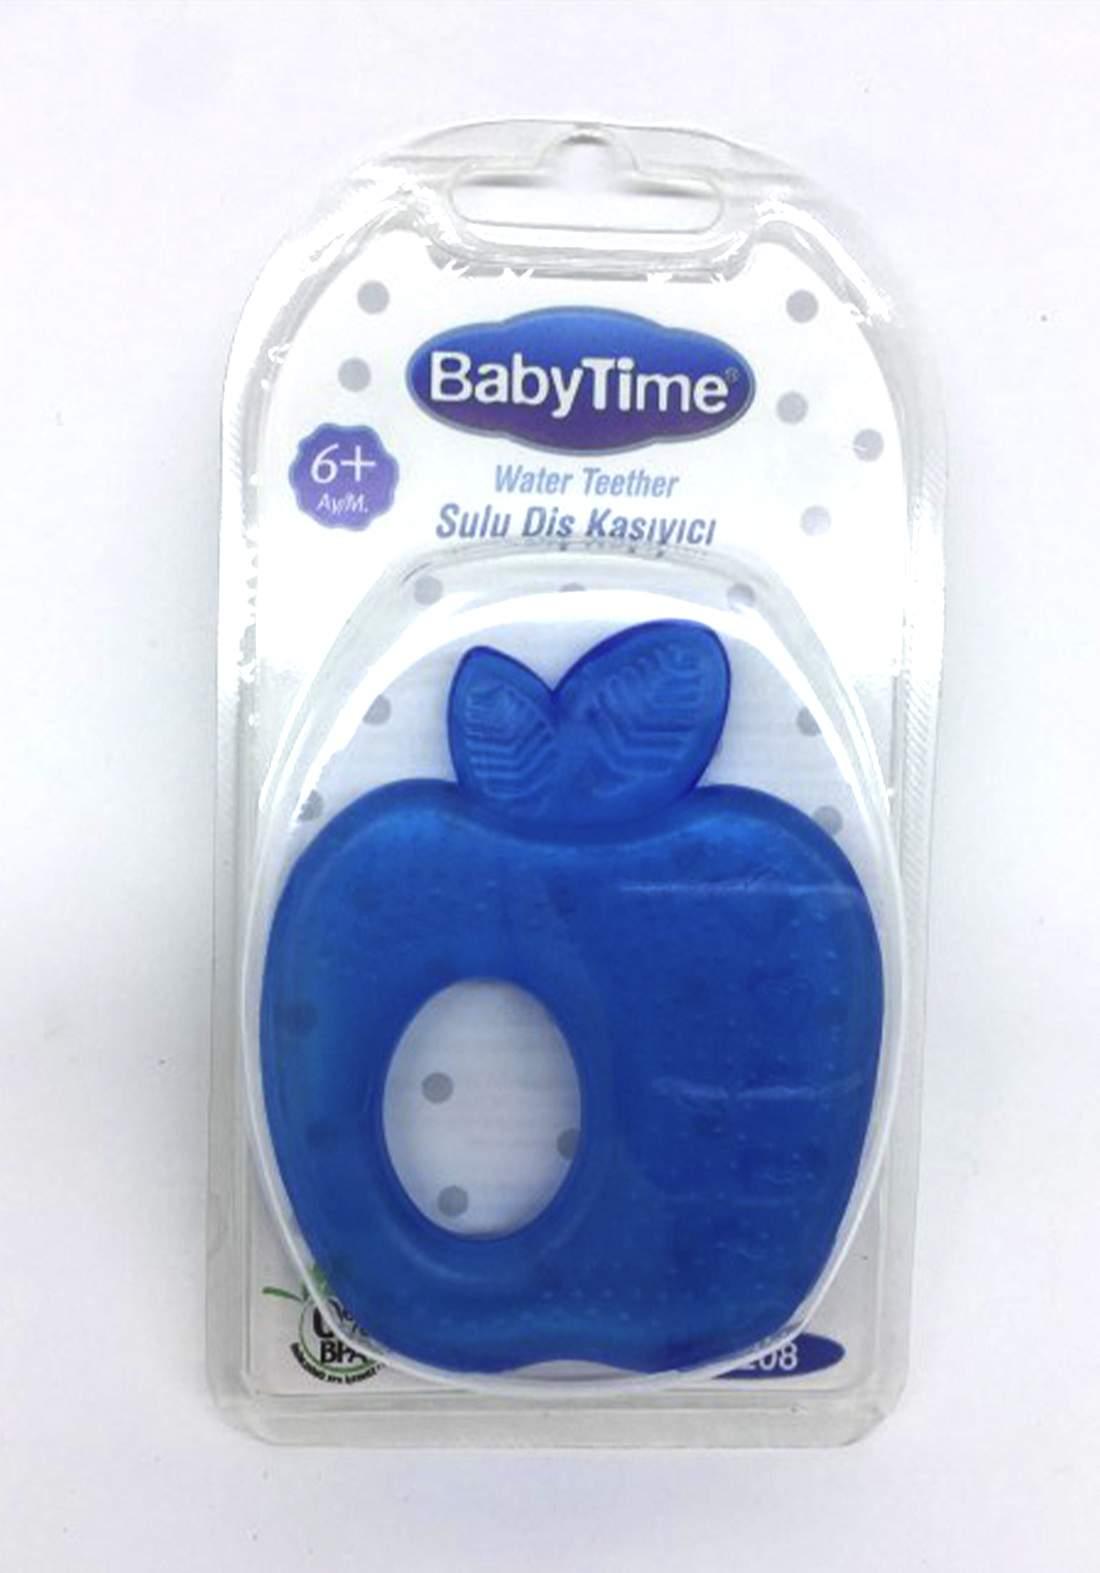 BabyTime BT208 Water Teether (+6m) - Blue  عضاضة طفل